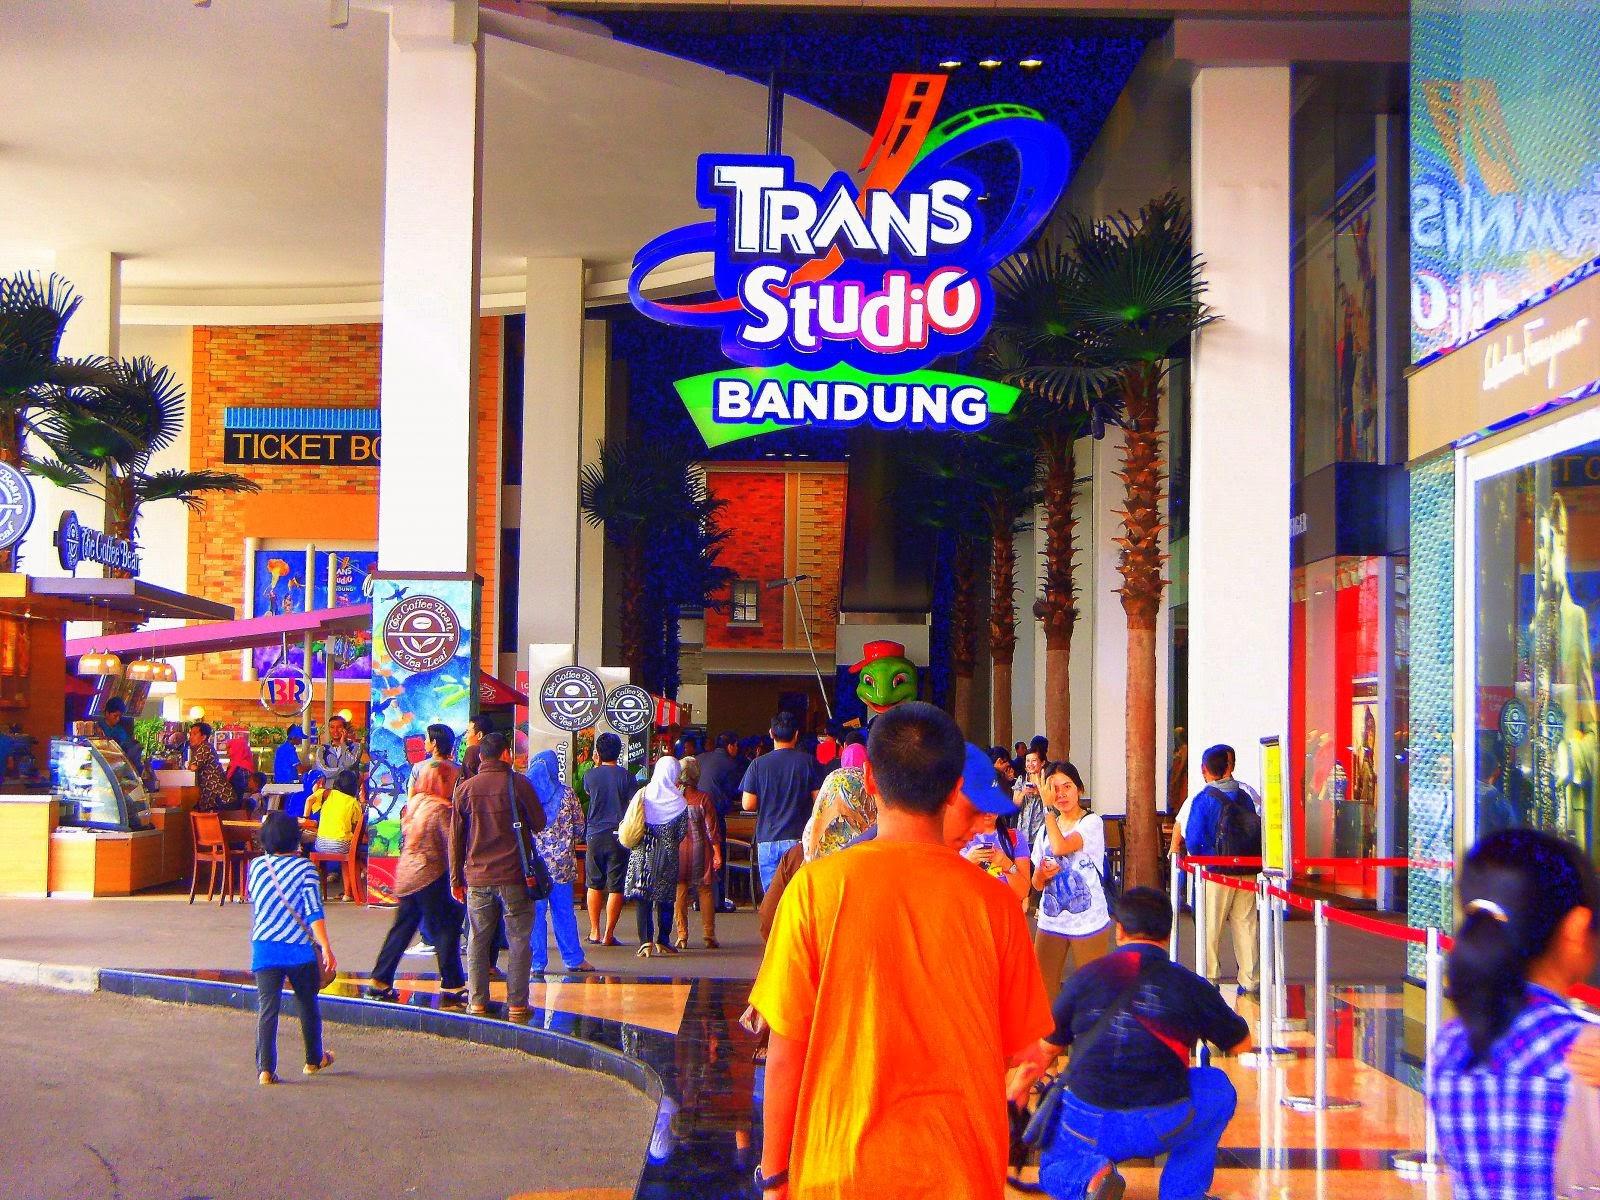 Trans Studio Bandung, Menikmati 20 Wahana Kelas Dunia